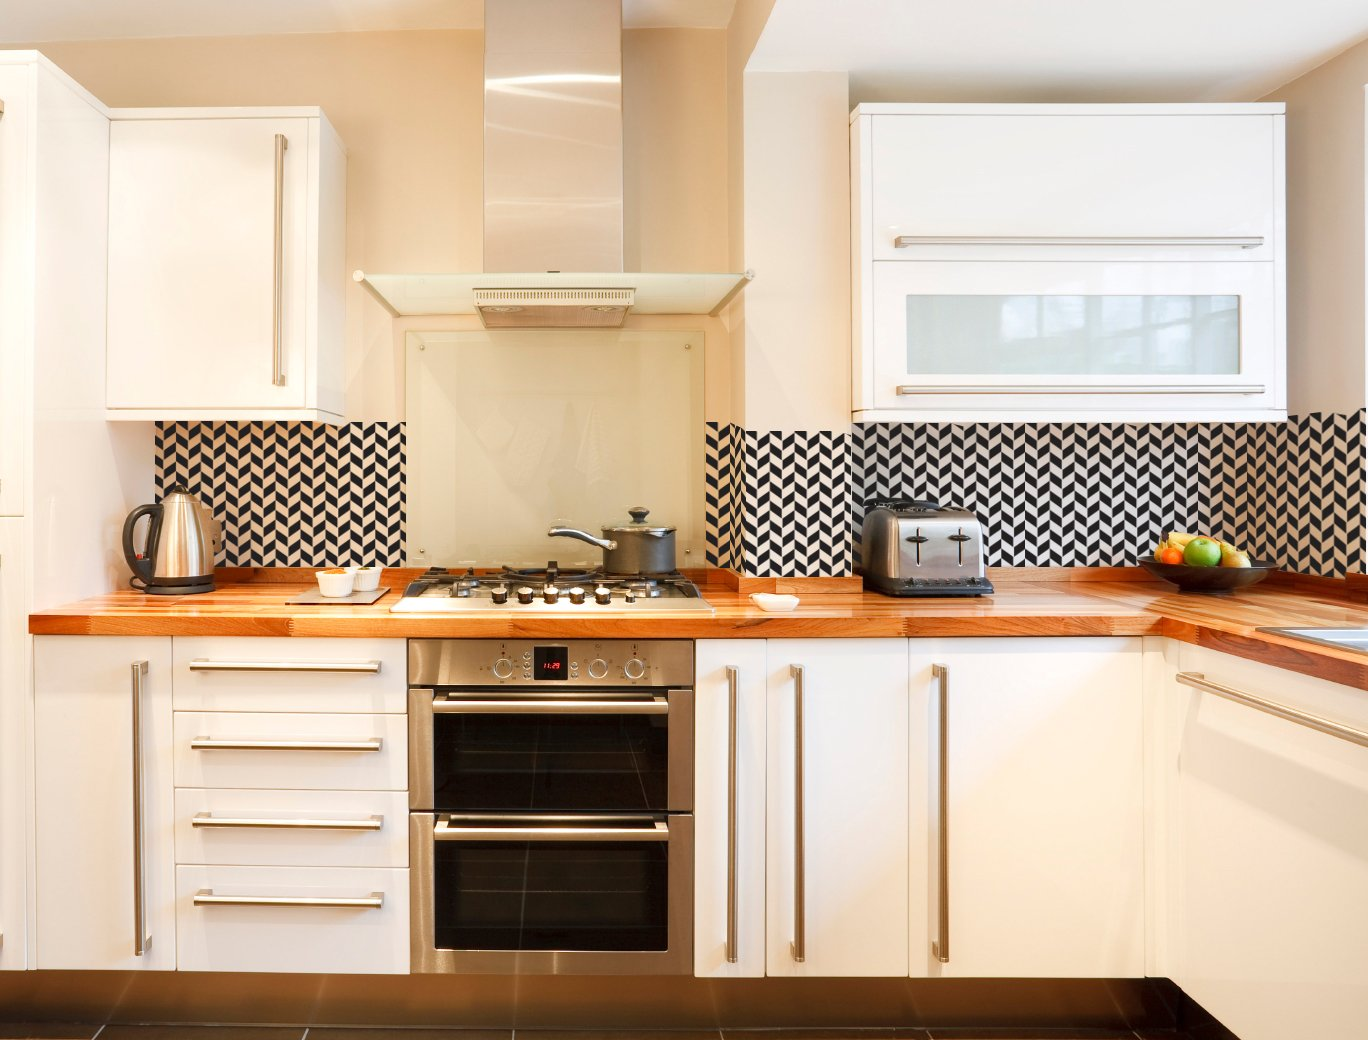 Modern Herringbone - Small - Custom Vinyl Wall Art Decal for Homes, Offices, Kids Rooms, Nurseries, Schools, High Schools, Colleges, Universities, Interior Designers, Architects, Remodelers